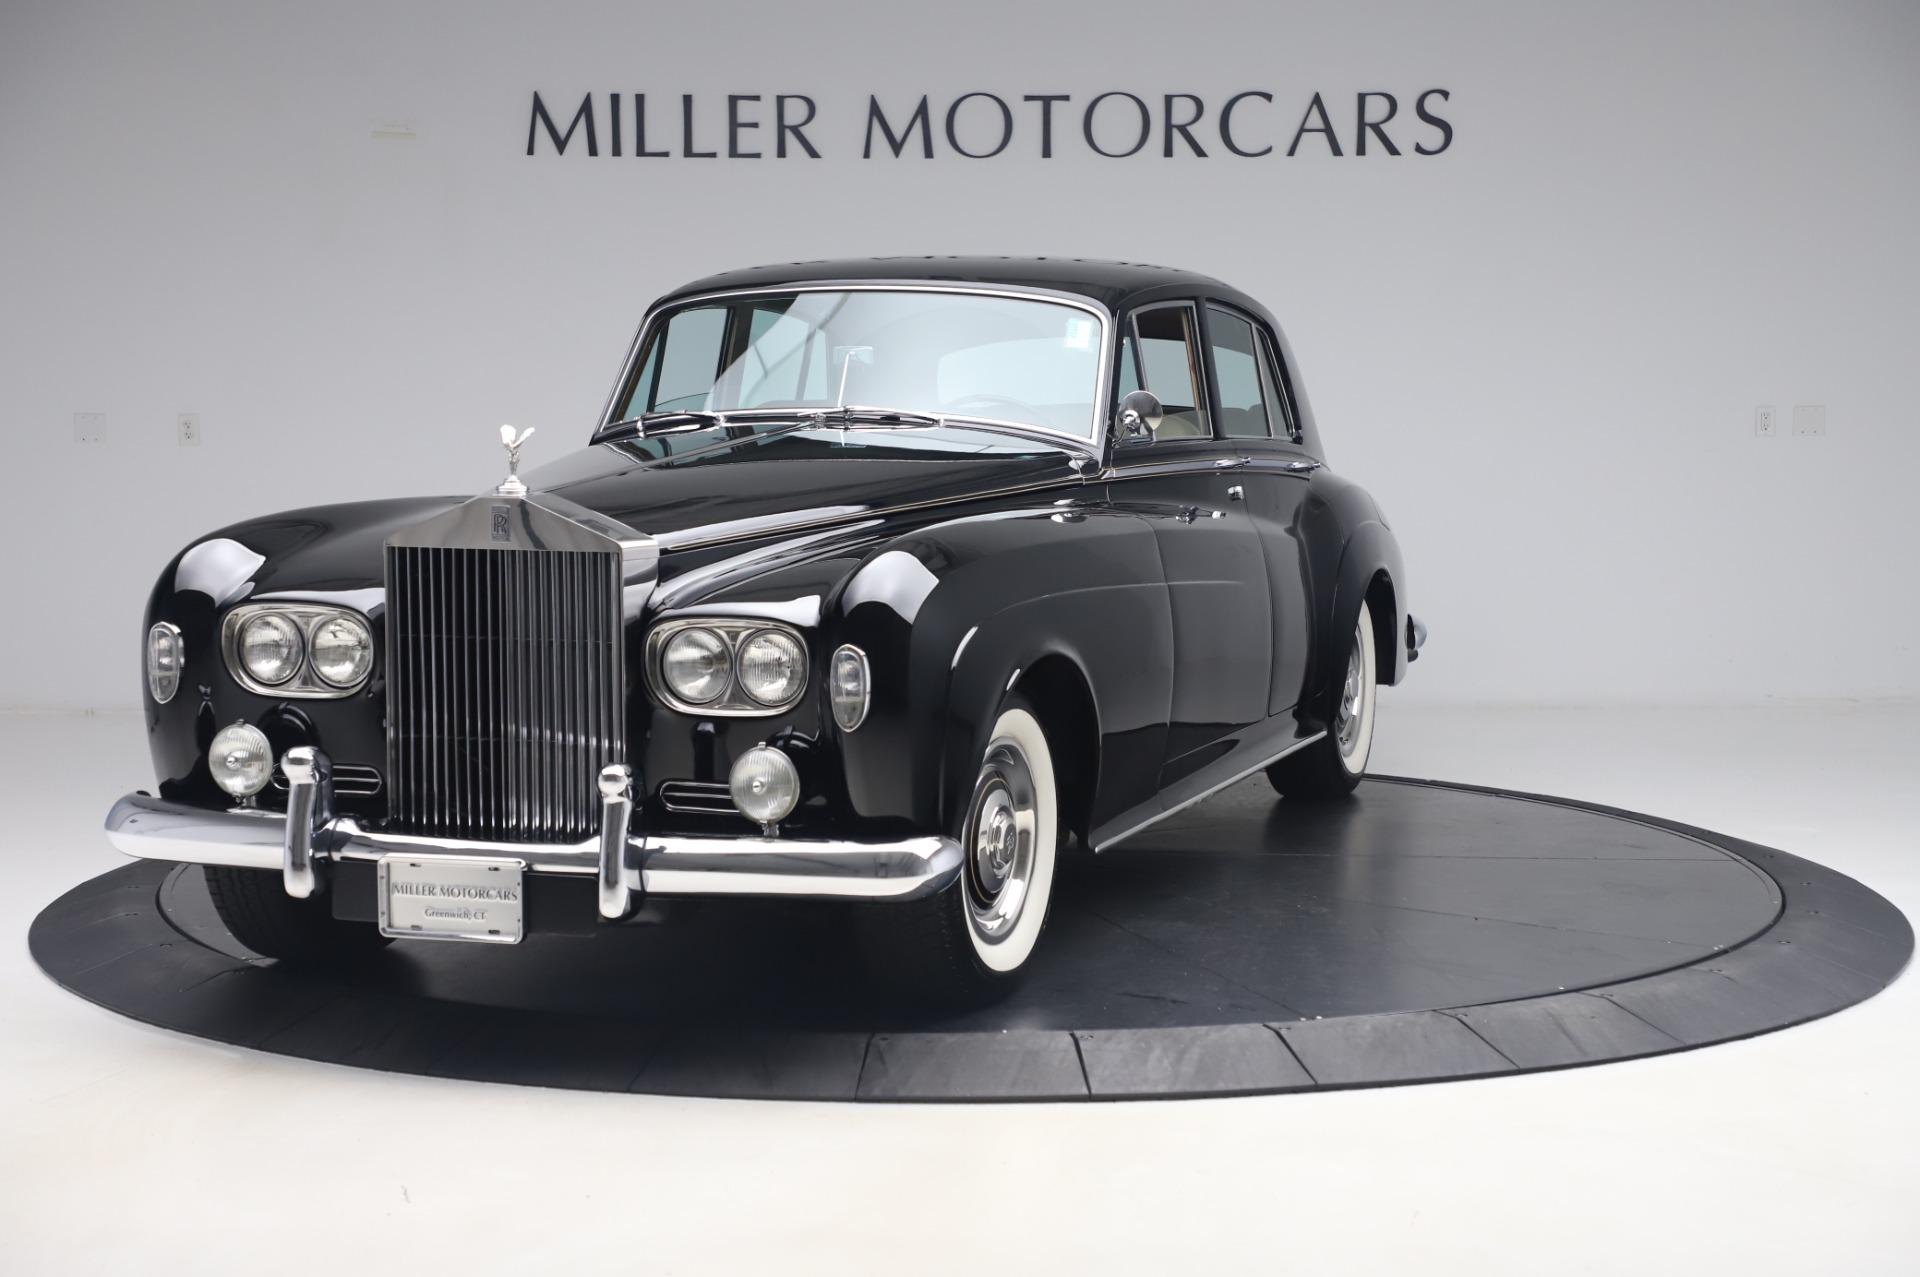 Used 1965 Rolls-Royce Silver Cloud III for sale $99,900 at Rolls-Royce Motor Cars Greenwich in Greenwich CT 06830 1